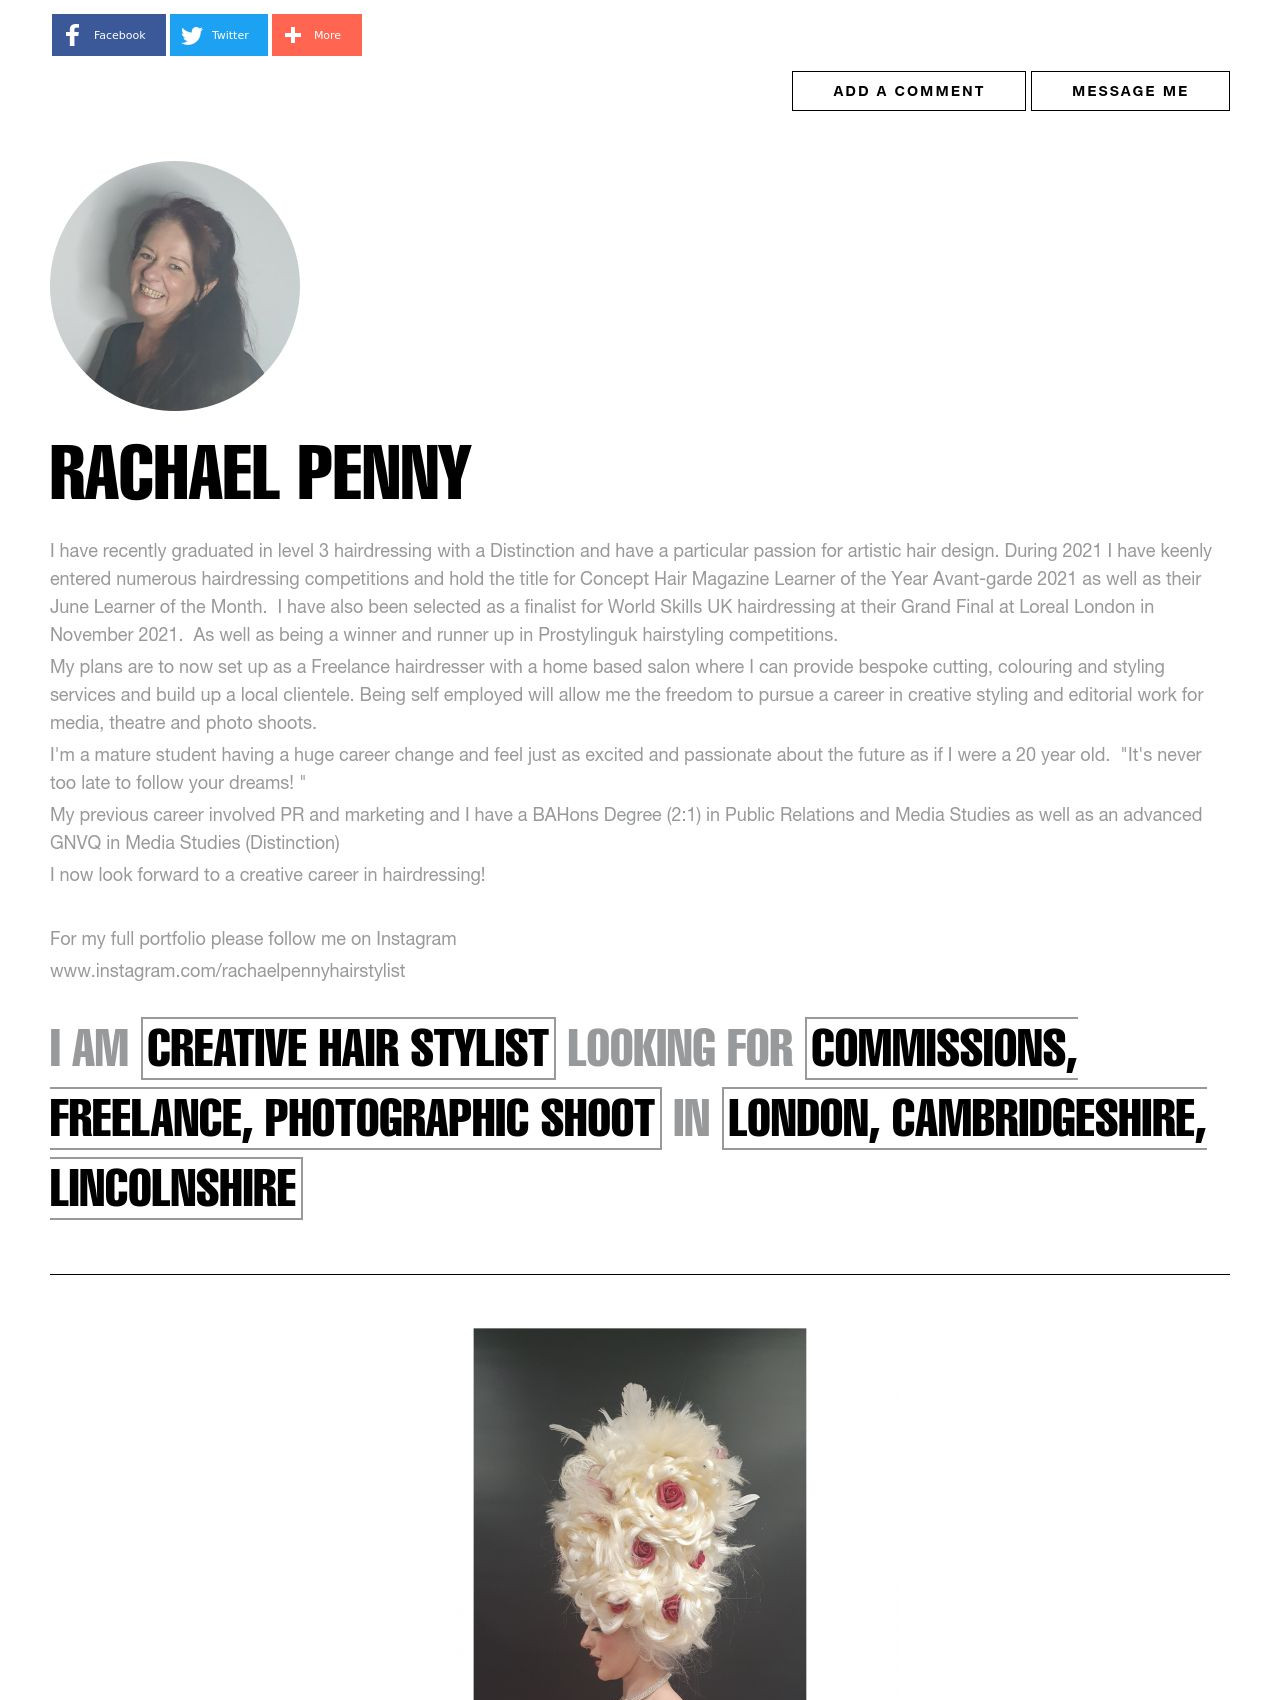 Rachael Penny